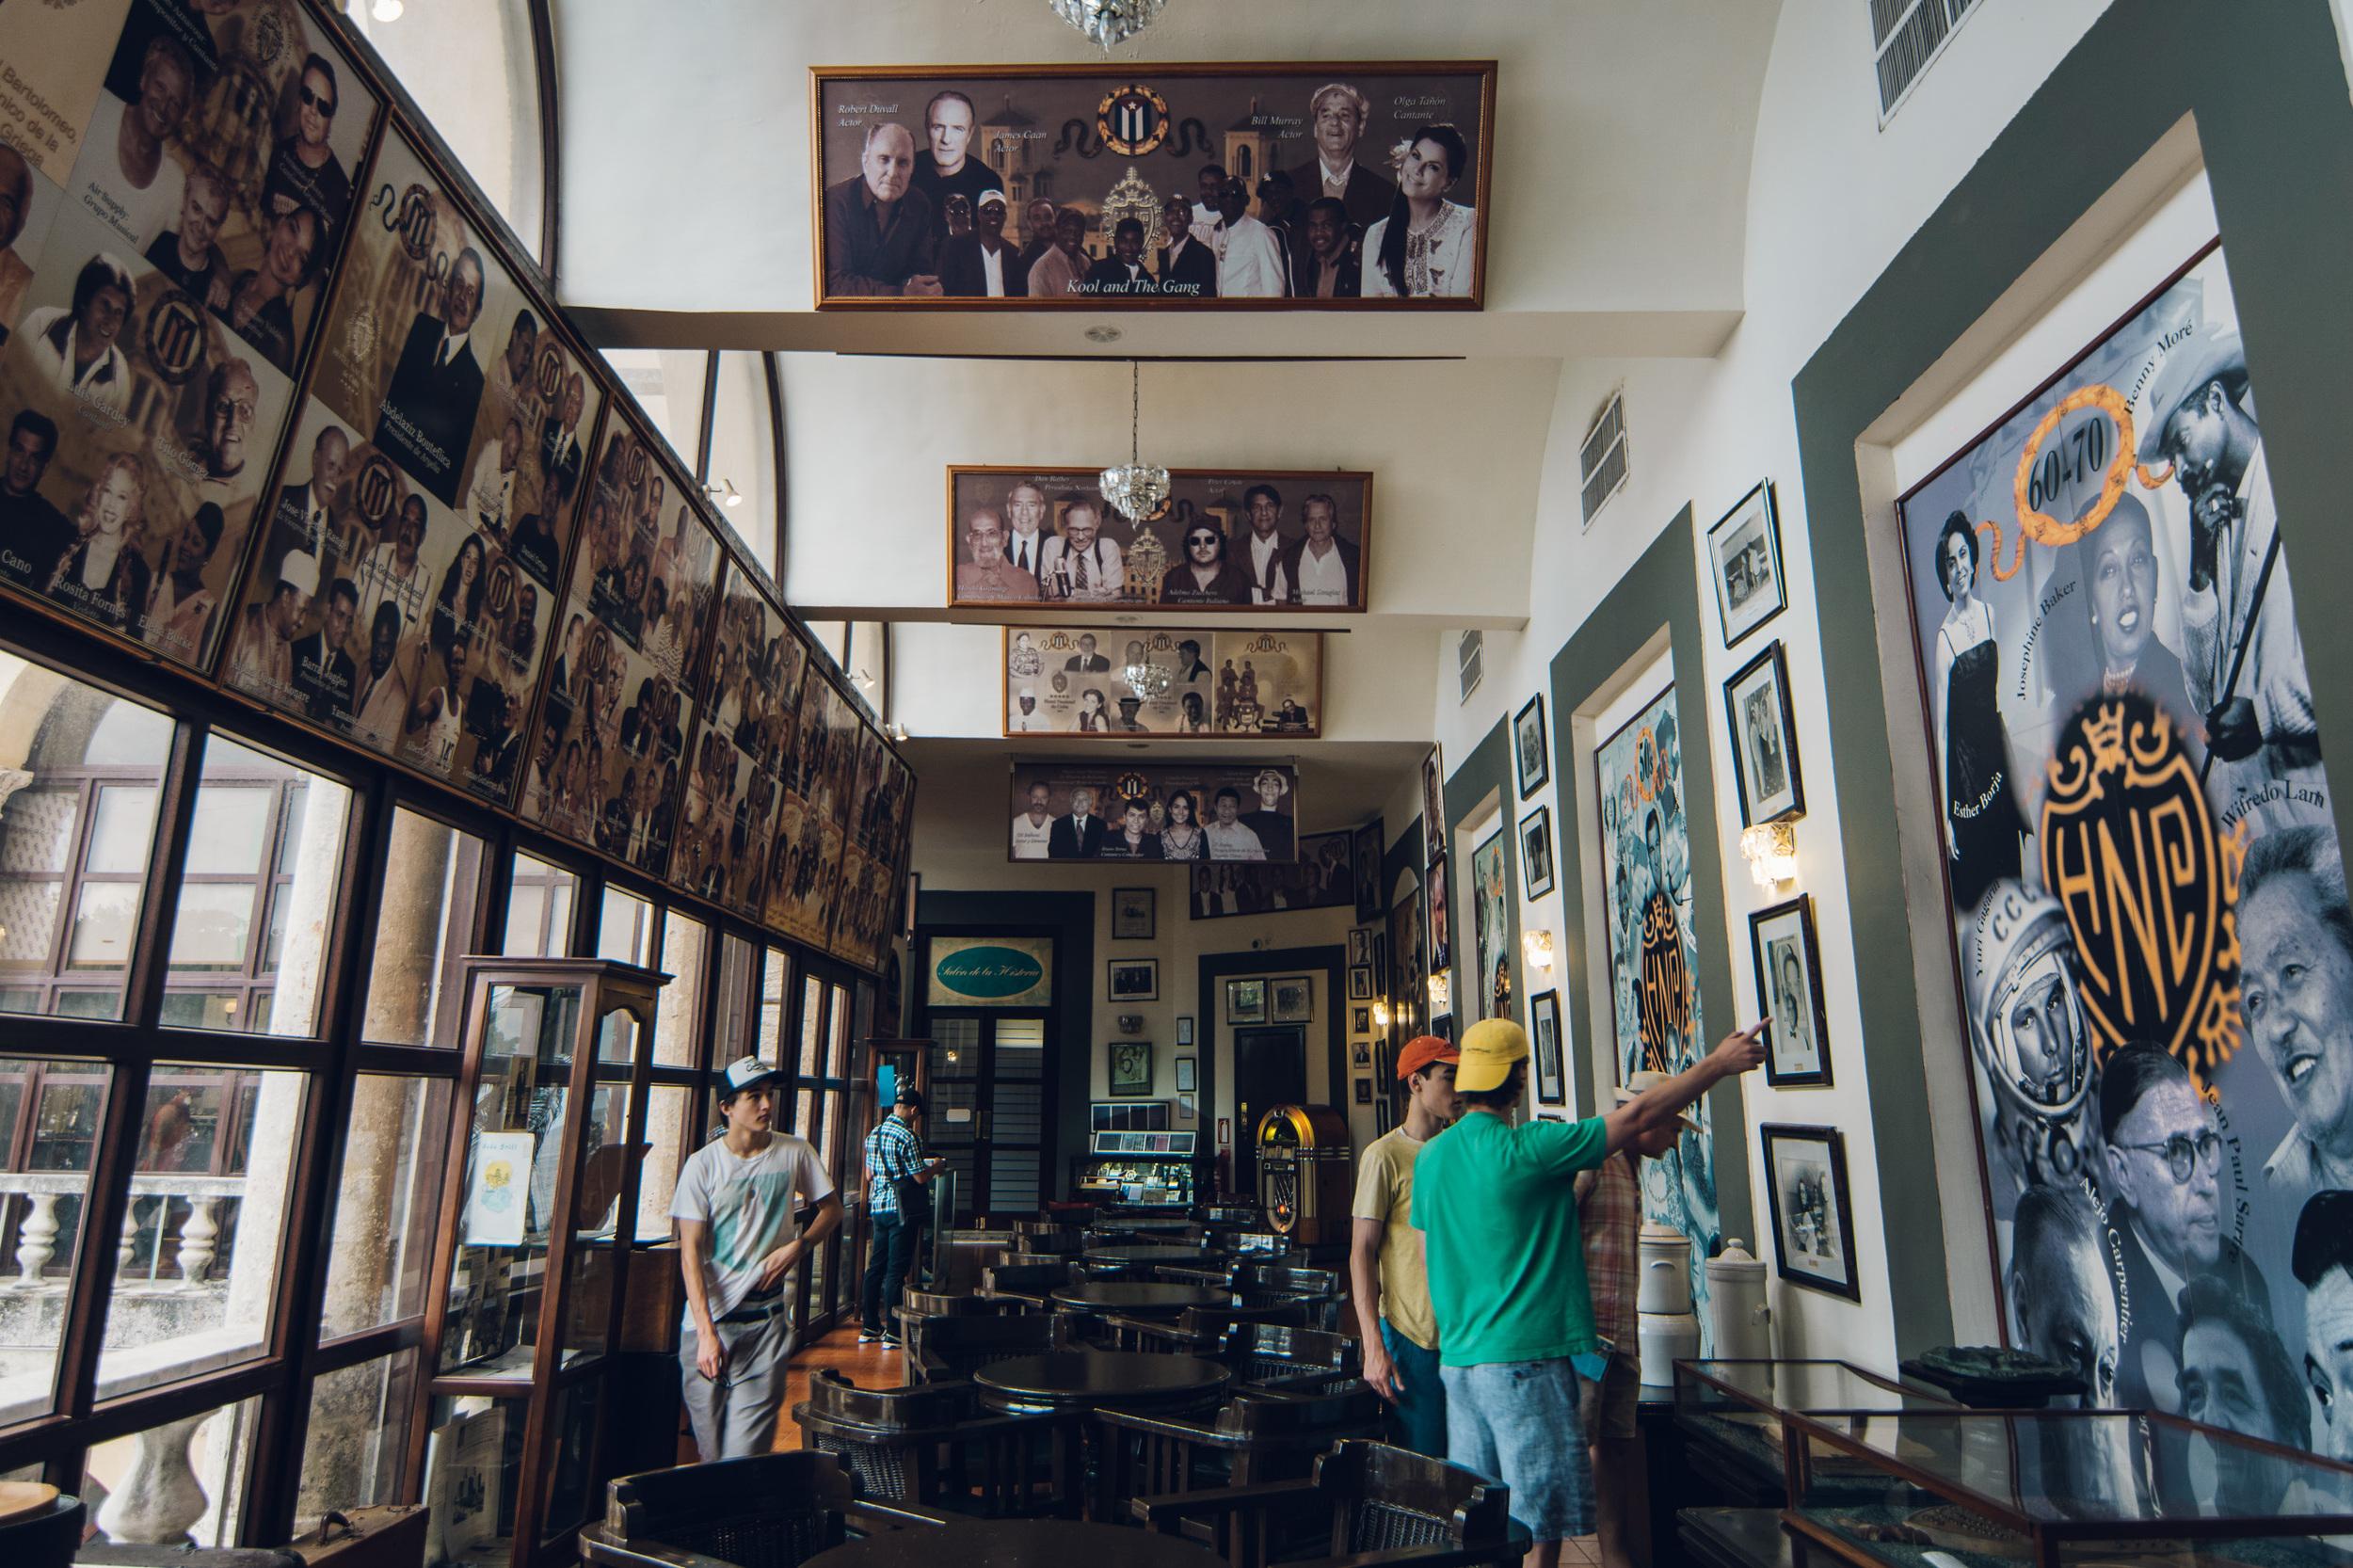 DeClaro-Photography-Cuba-02550.jpg